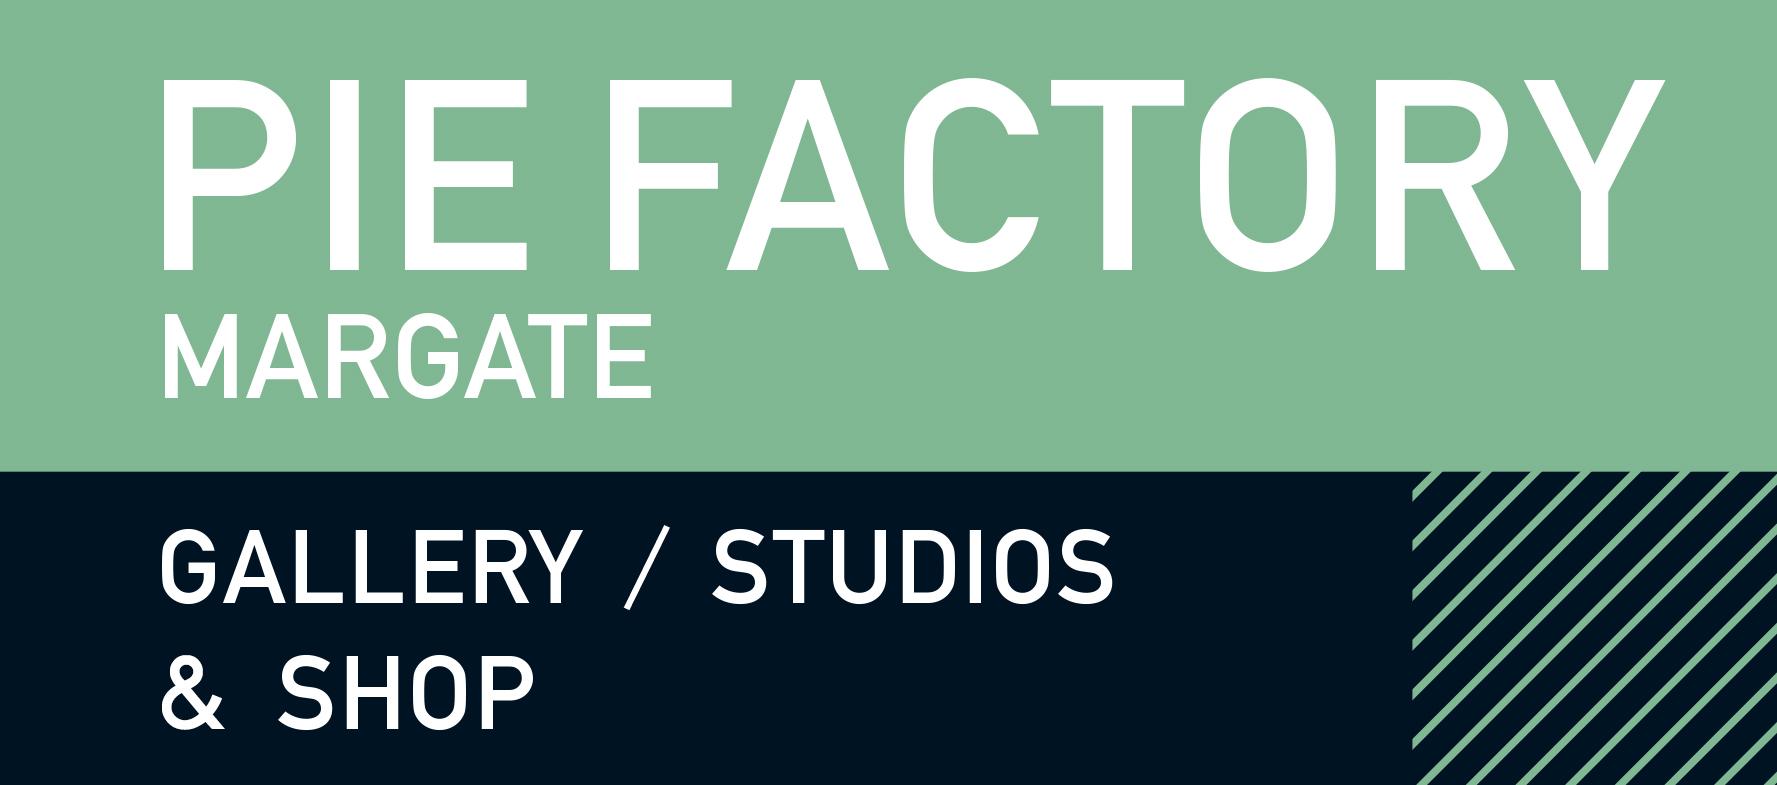 Pie Factory Margate margate now festival 2019